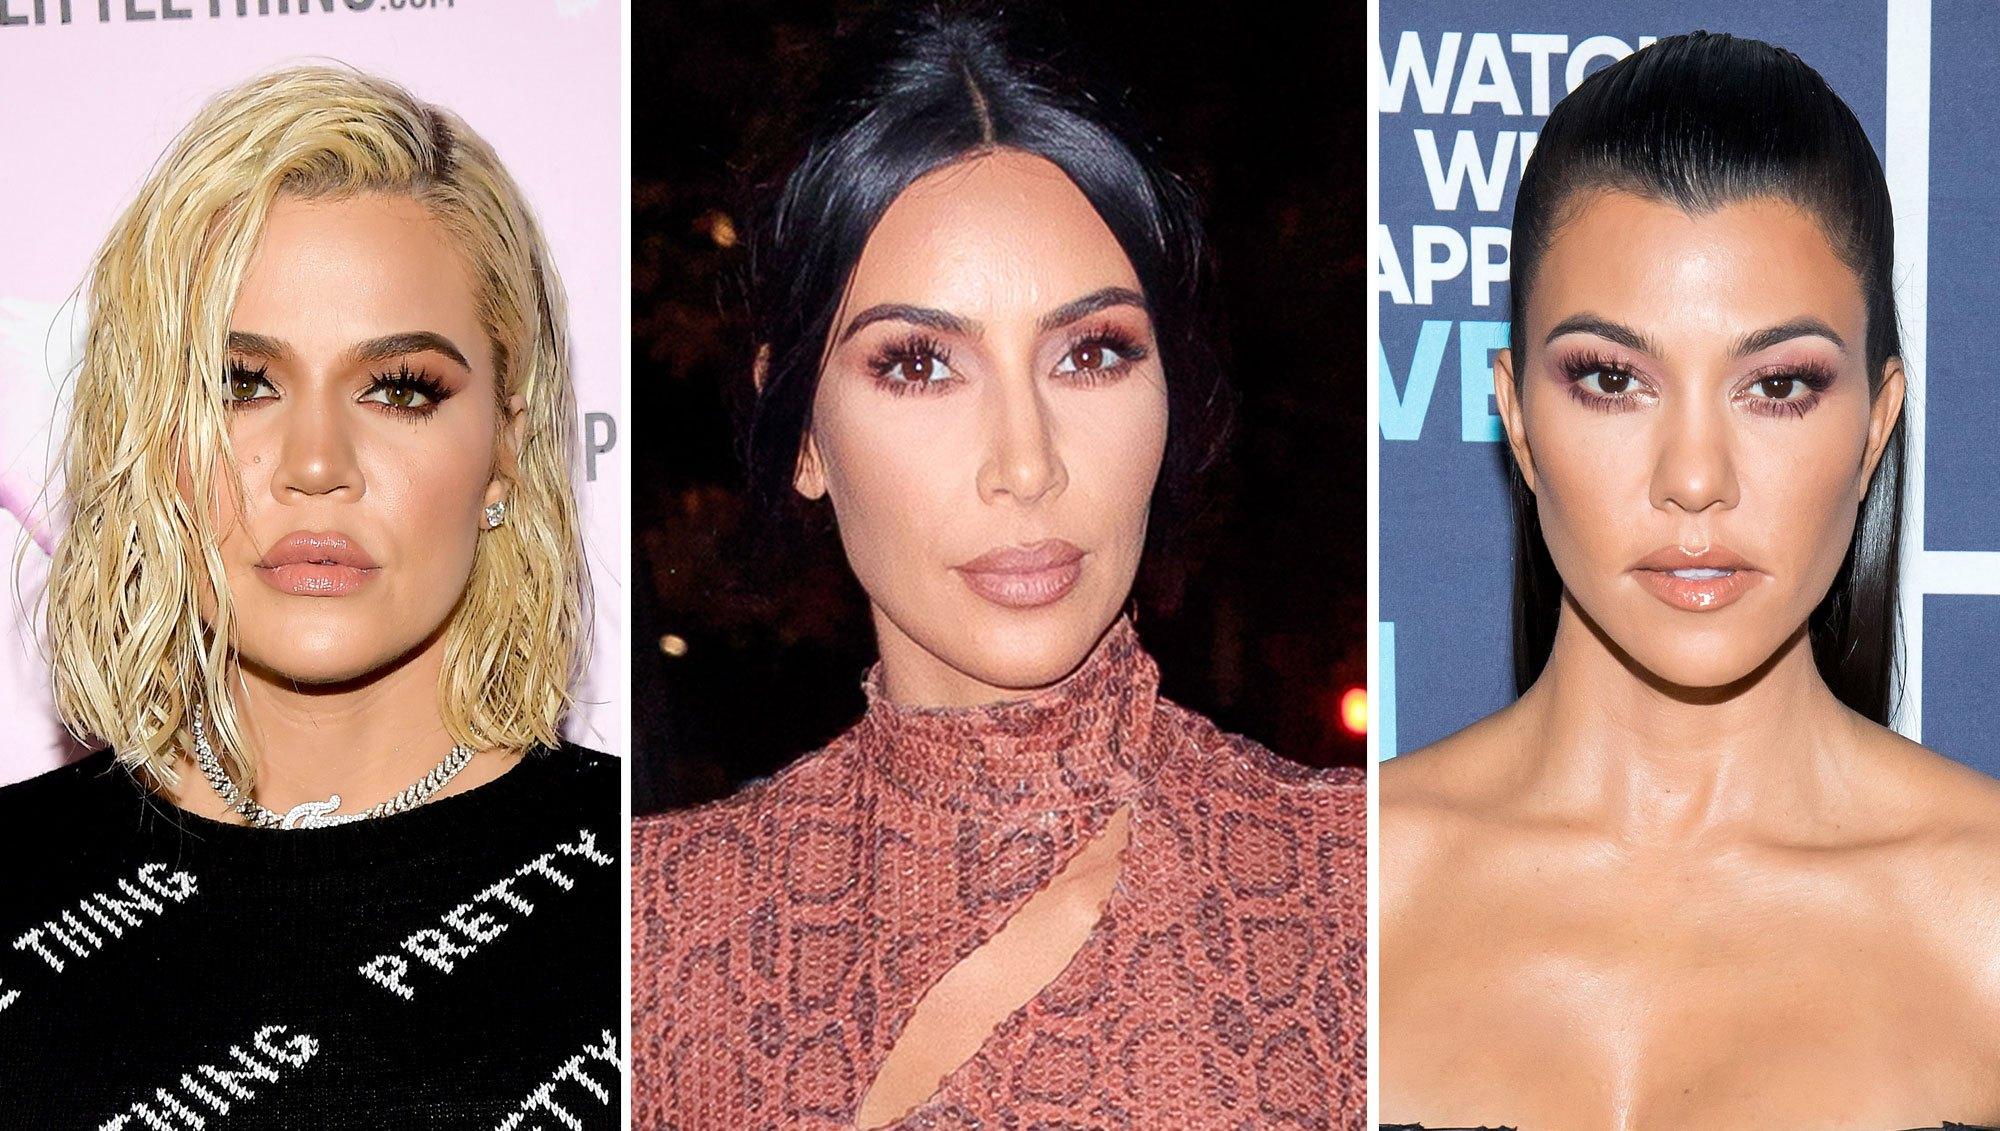 Khloe, Kim and Kourtney Kardashian Head to Palm Springs Amid Drama With Jordyn Woods and Tristan Thompson